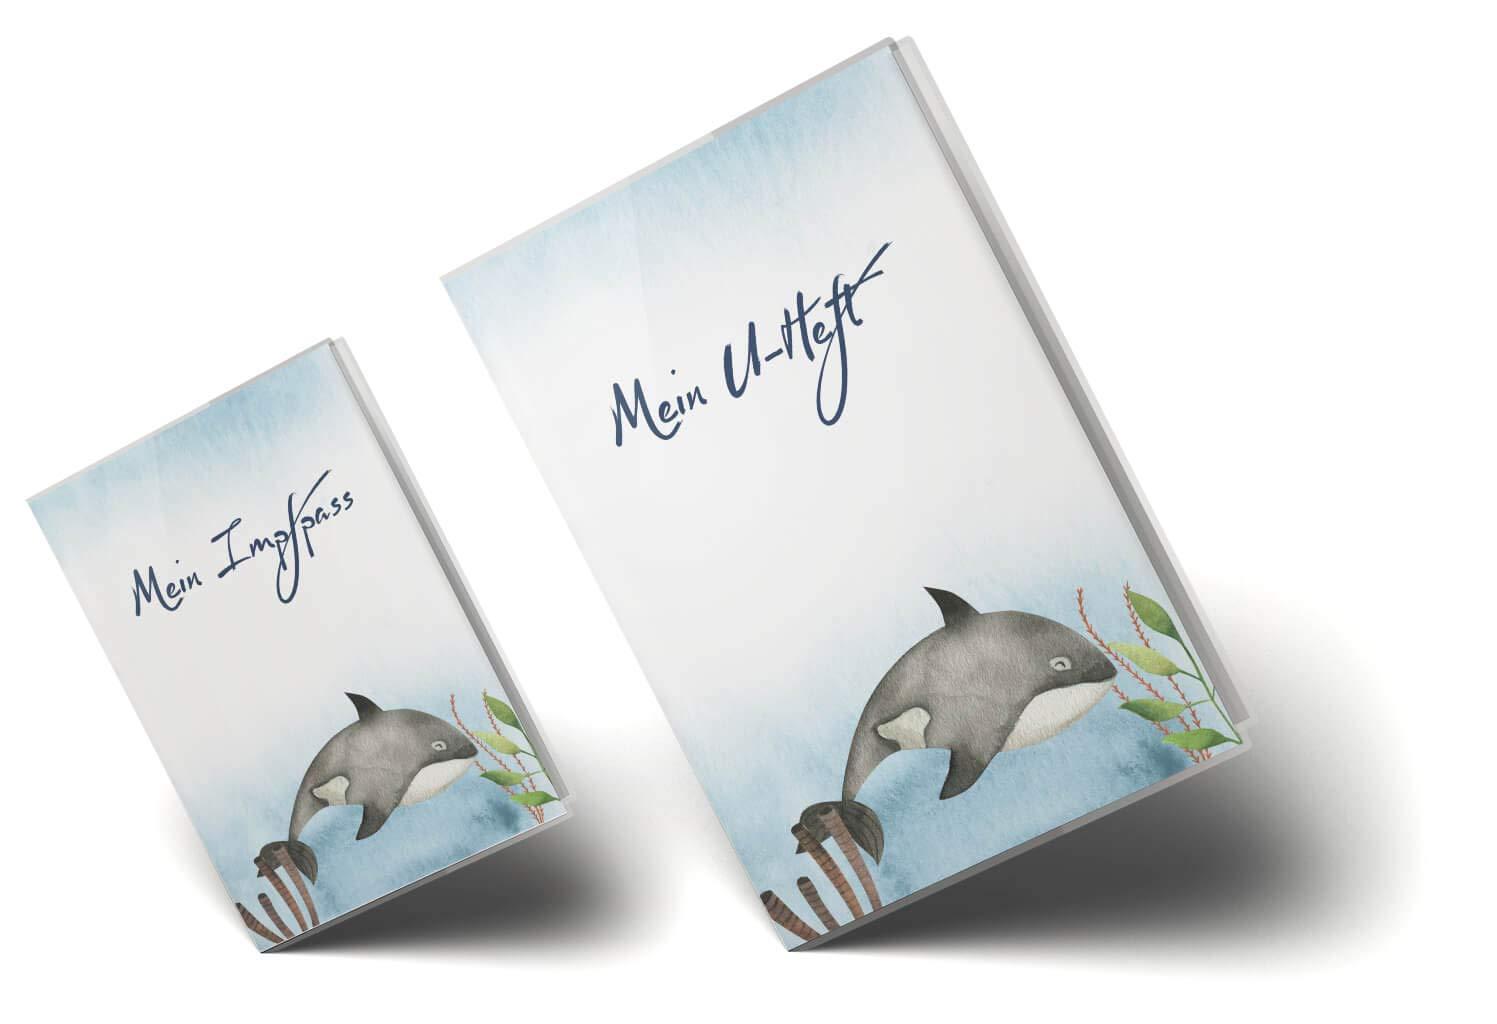 U-Heft H/ülle SET Walfisch Untersuchungsheft H/ülle /& Impfpassh/ülle Schwangerschaft Geschenkidee personalisierbar mit Namen U-Heft Set 3-teilig, Blauwal